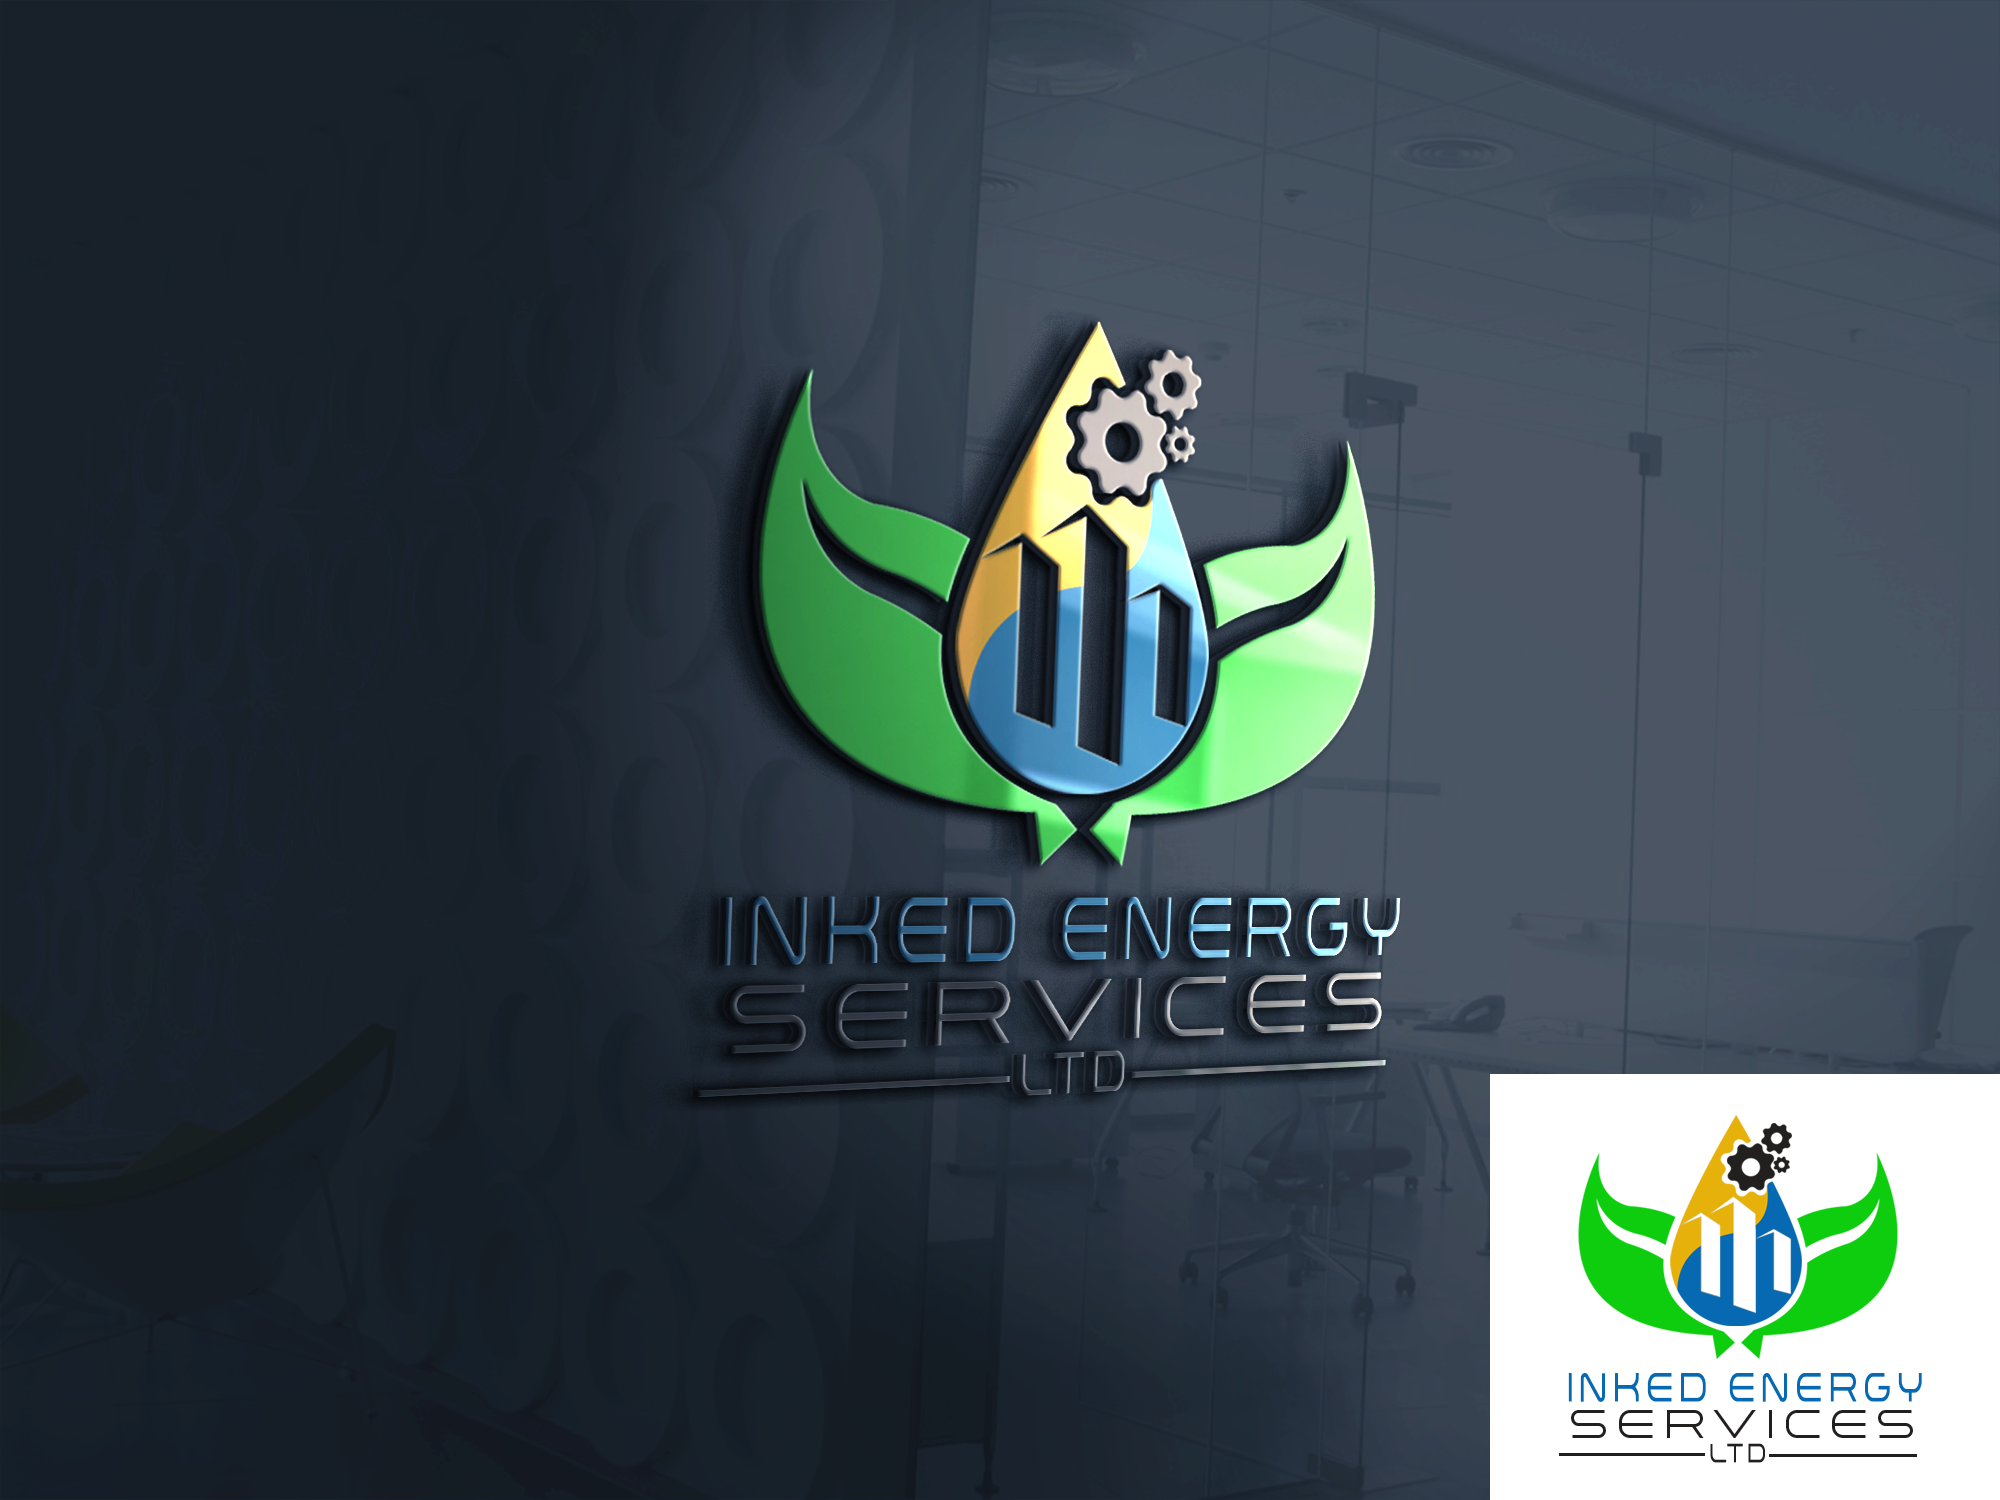 Logo Design by John Melvie Sulla - Entry No. 55 in the Logo Design Contest Creative Logo Design for INKED ENERGY SERVICES LTD.